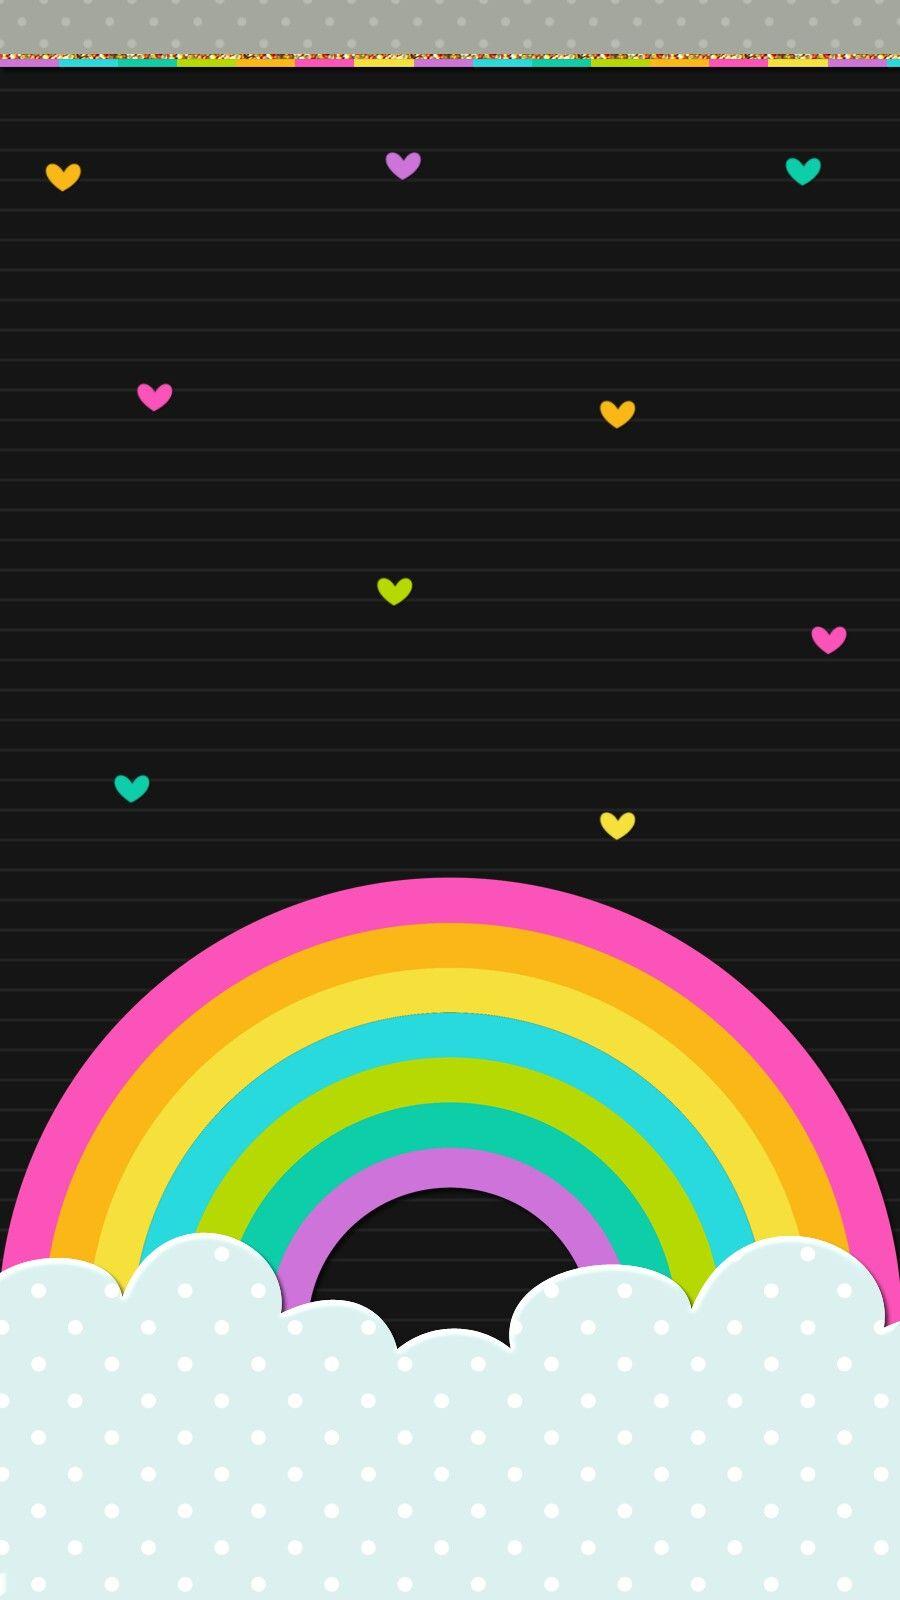 Wallpaper Iphone Rainbow Wallpaper Iphone Wallpaper Watercolor Wallpaper Phone